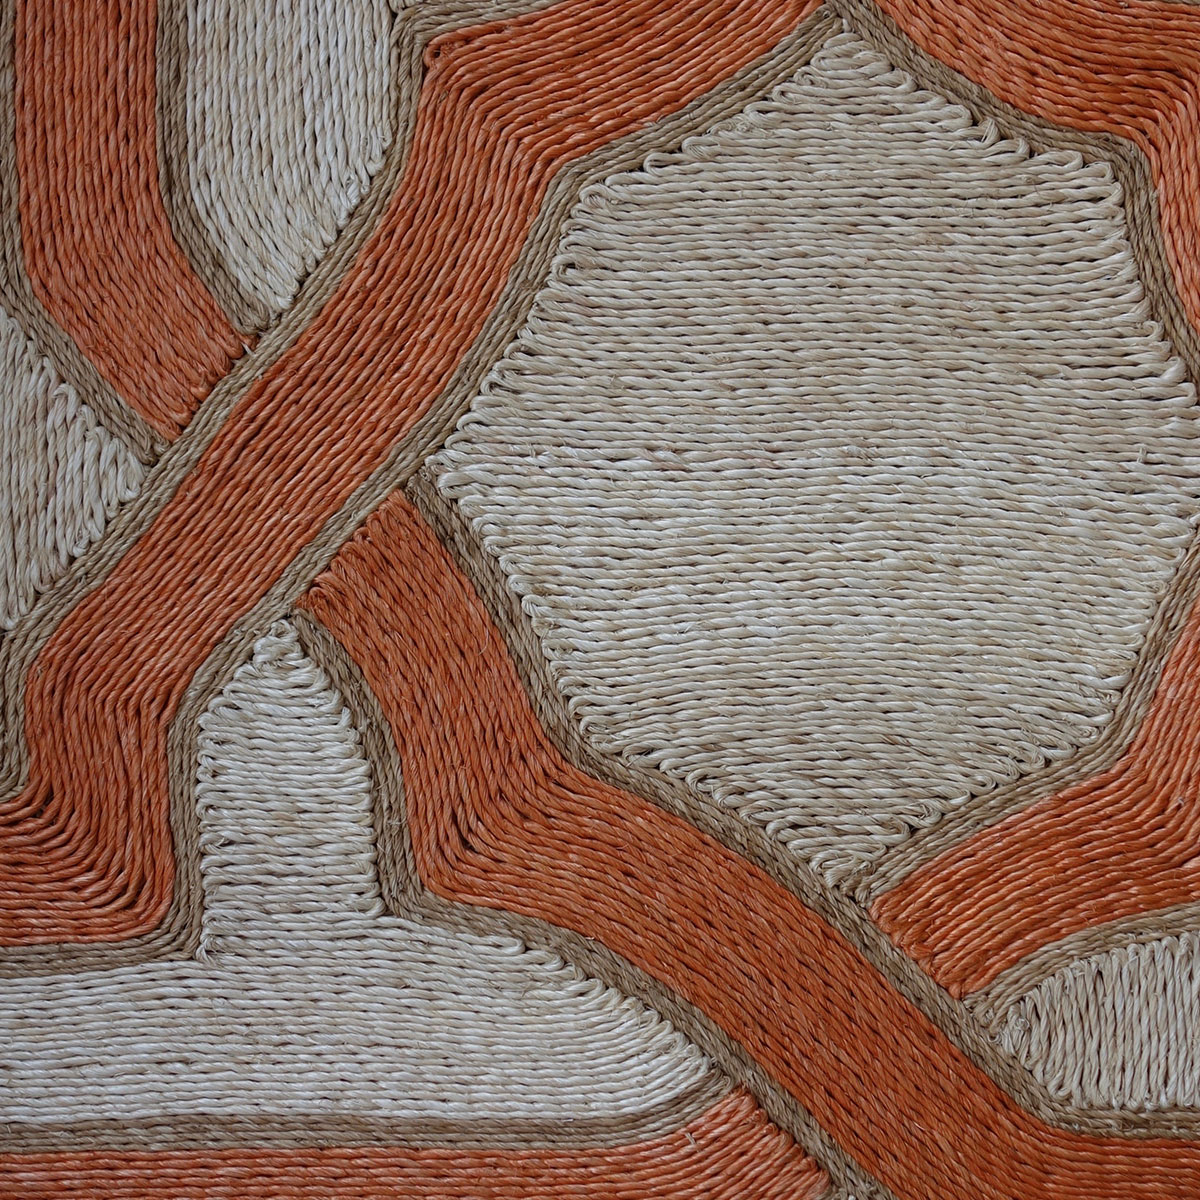 arabesque-maze_abaca_hand-woven_patterson-flynn-martin_pfm